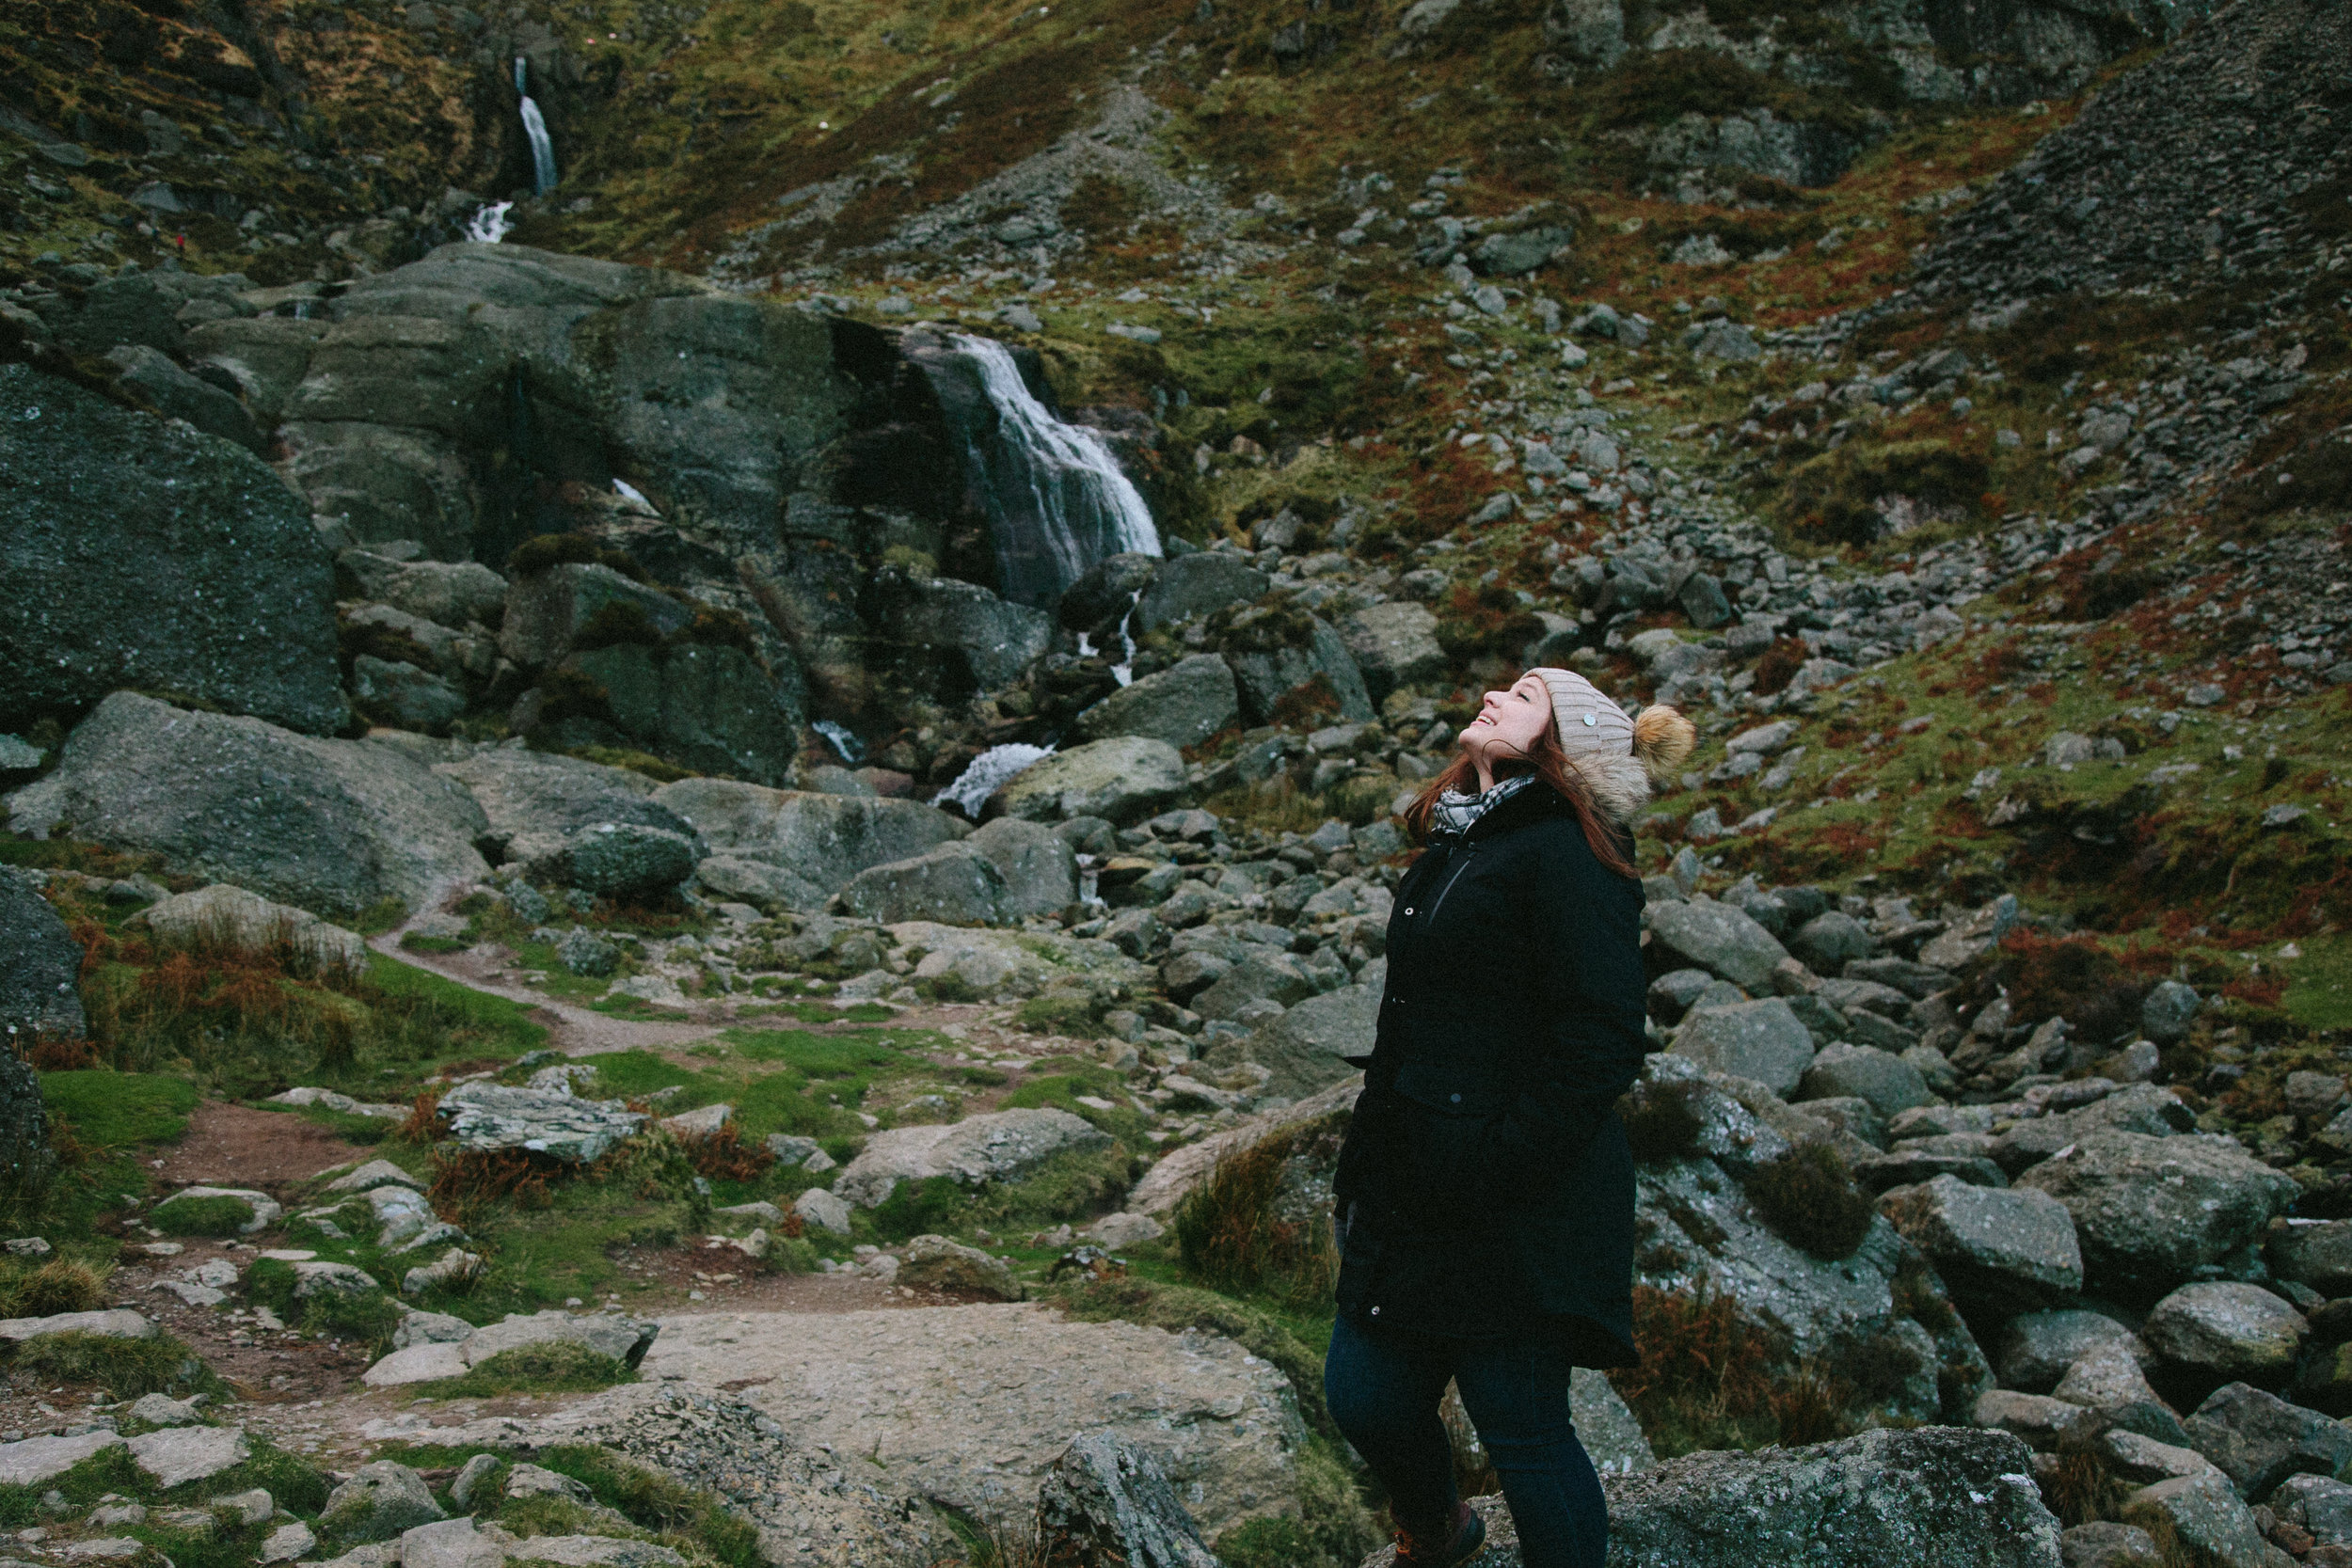 Snookums at Waterfall-1.jpg